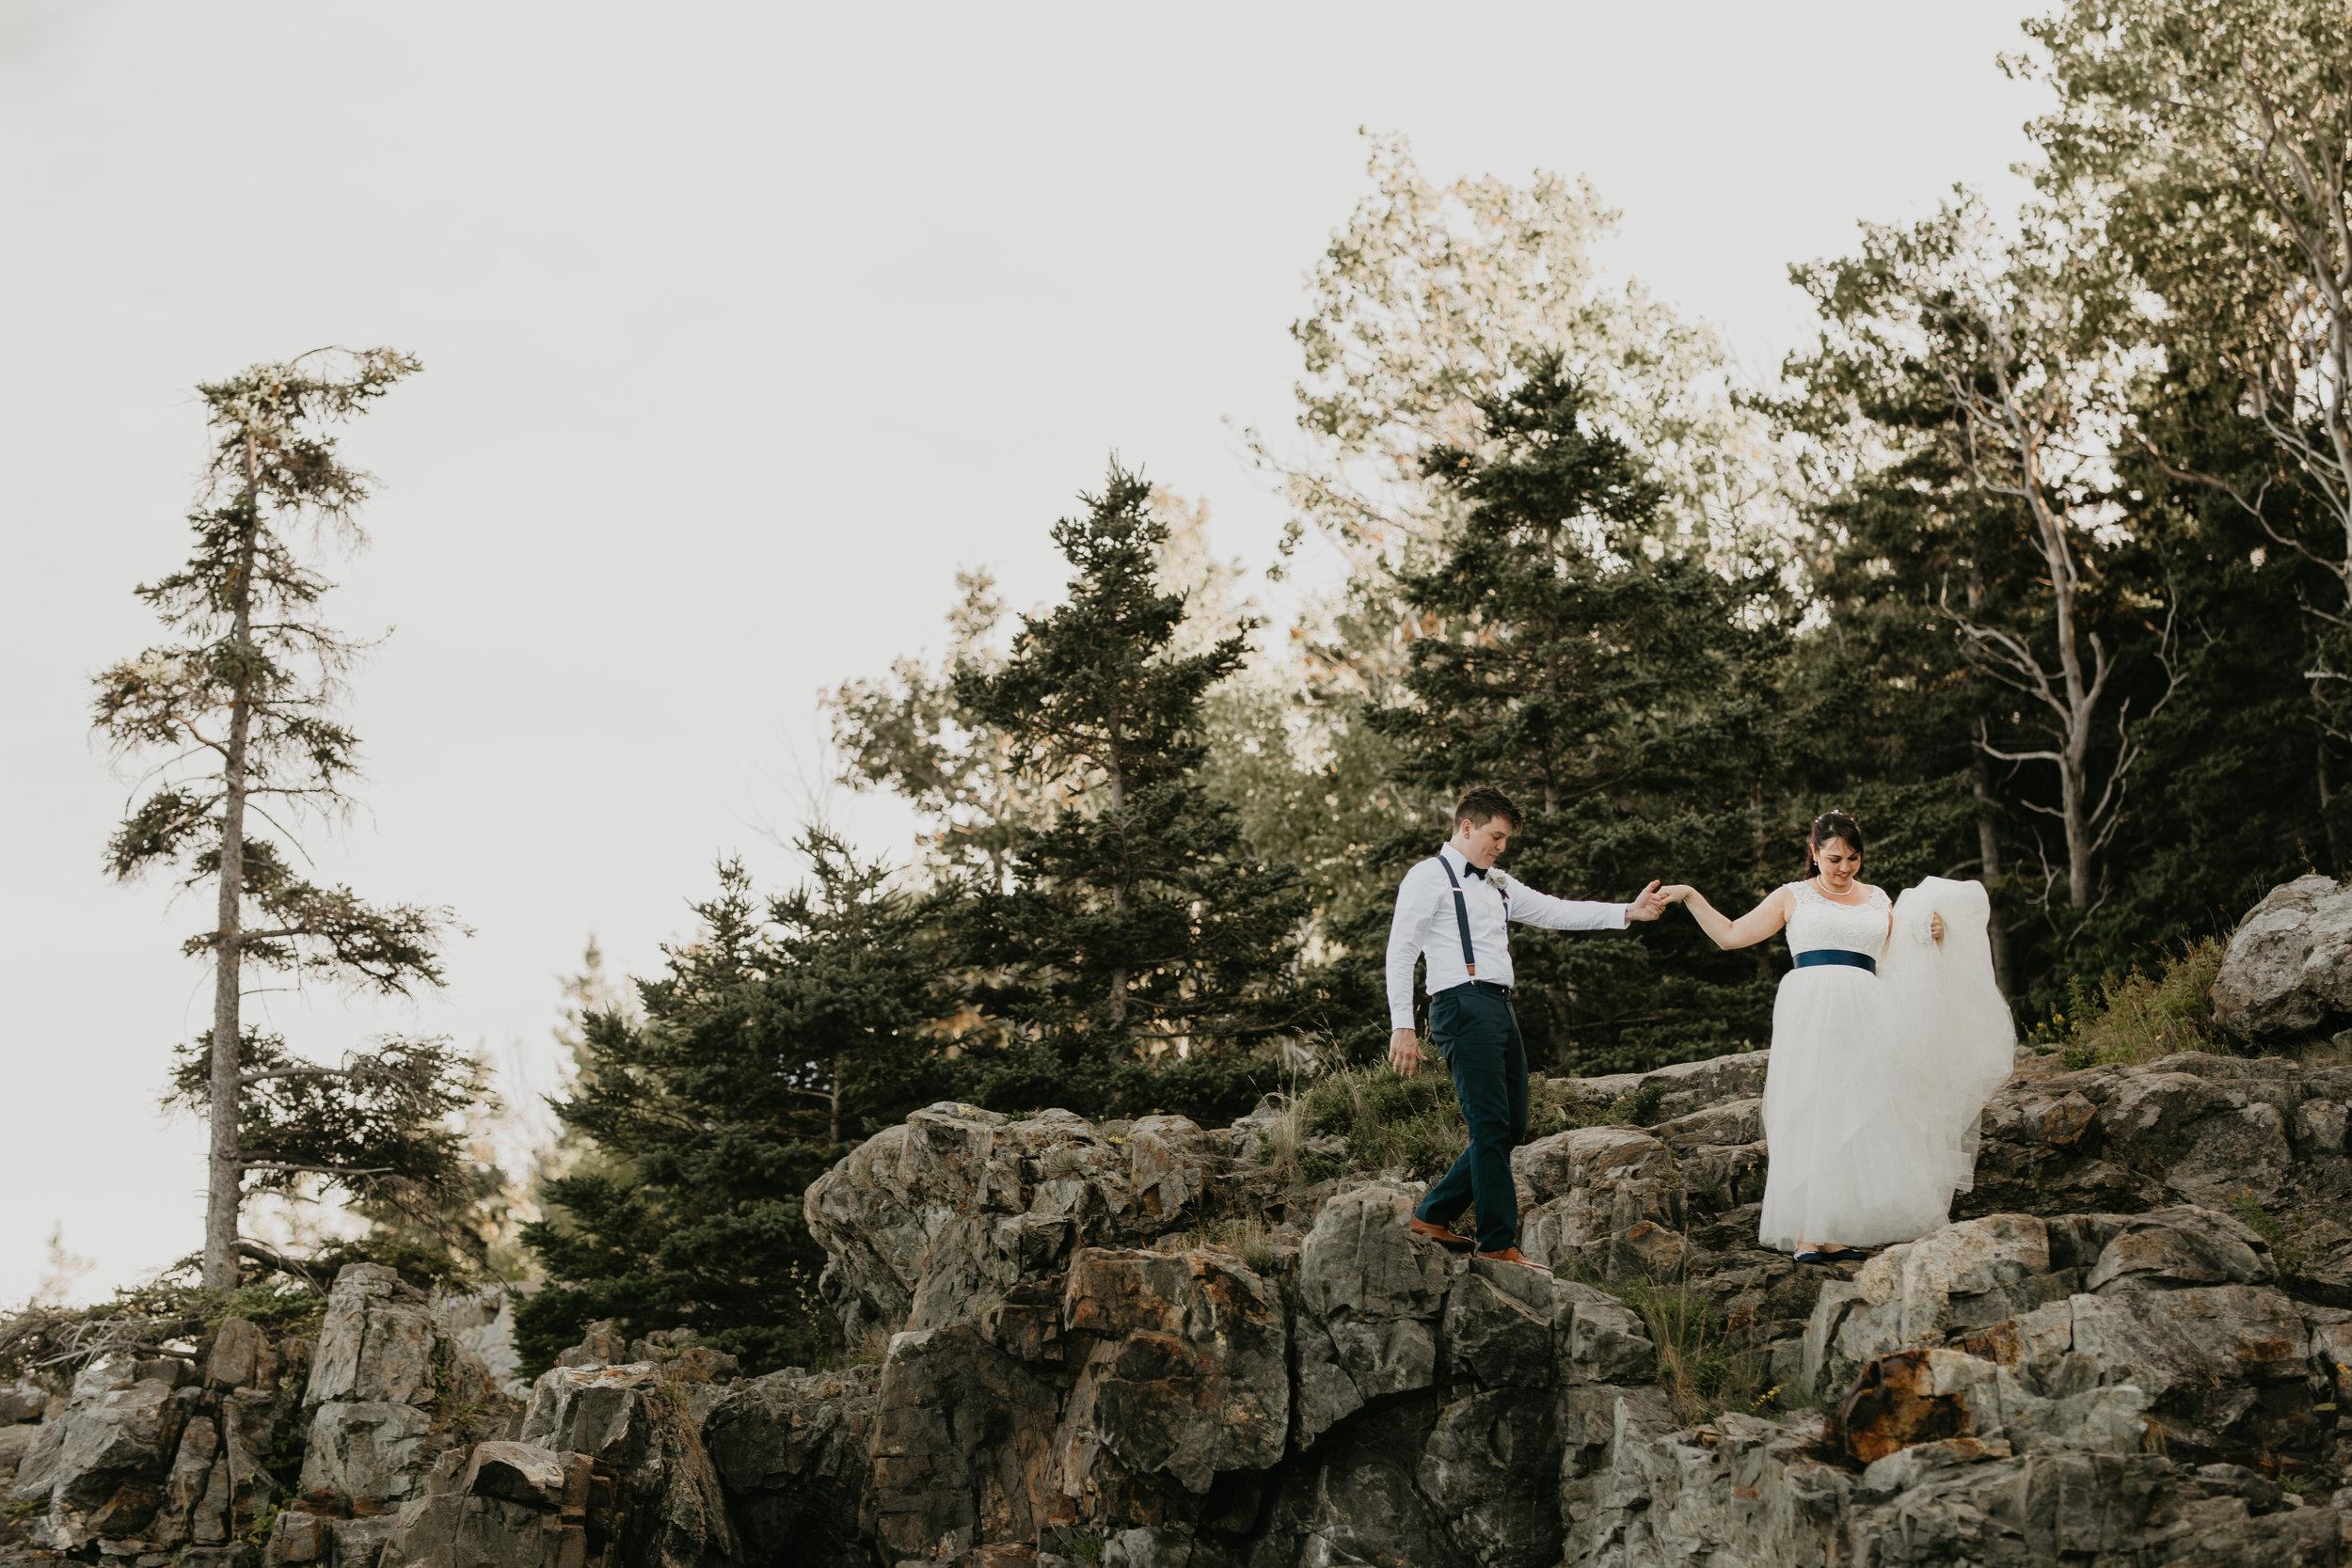 nicole-daacke-photography-Elopement-rocky-shoreline-coast-Acadia-National-Park-elopement-photographer-inspiration-maine-elopement-otter-cliffs-schoonic-head-point-35.jpg